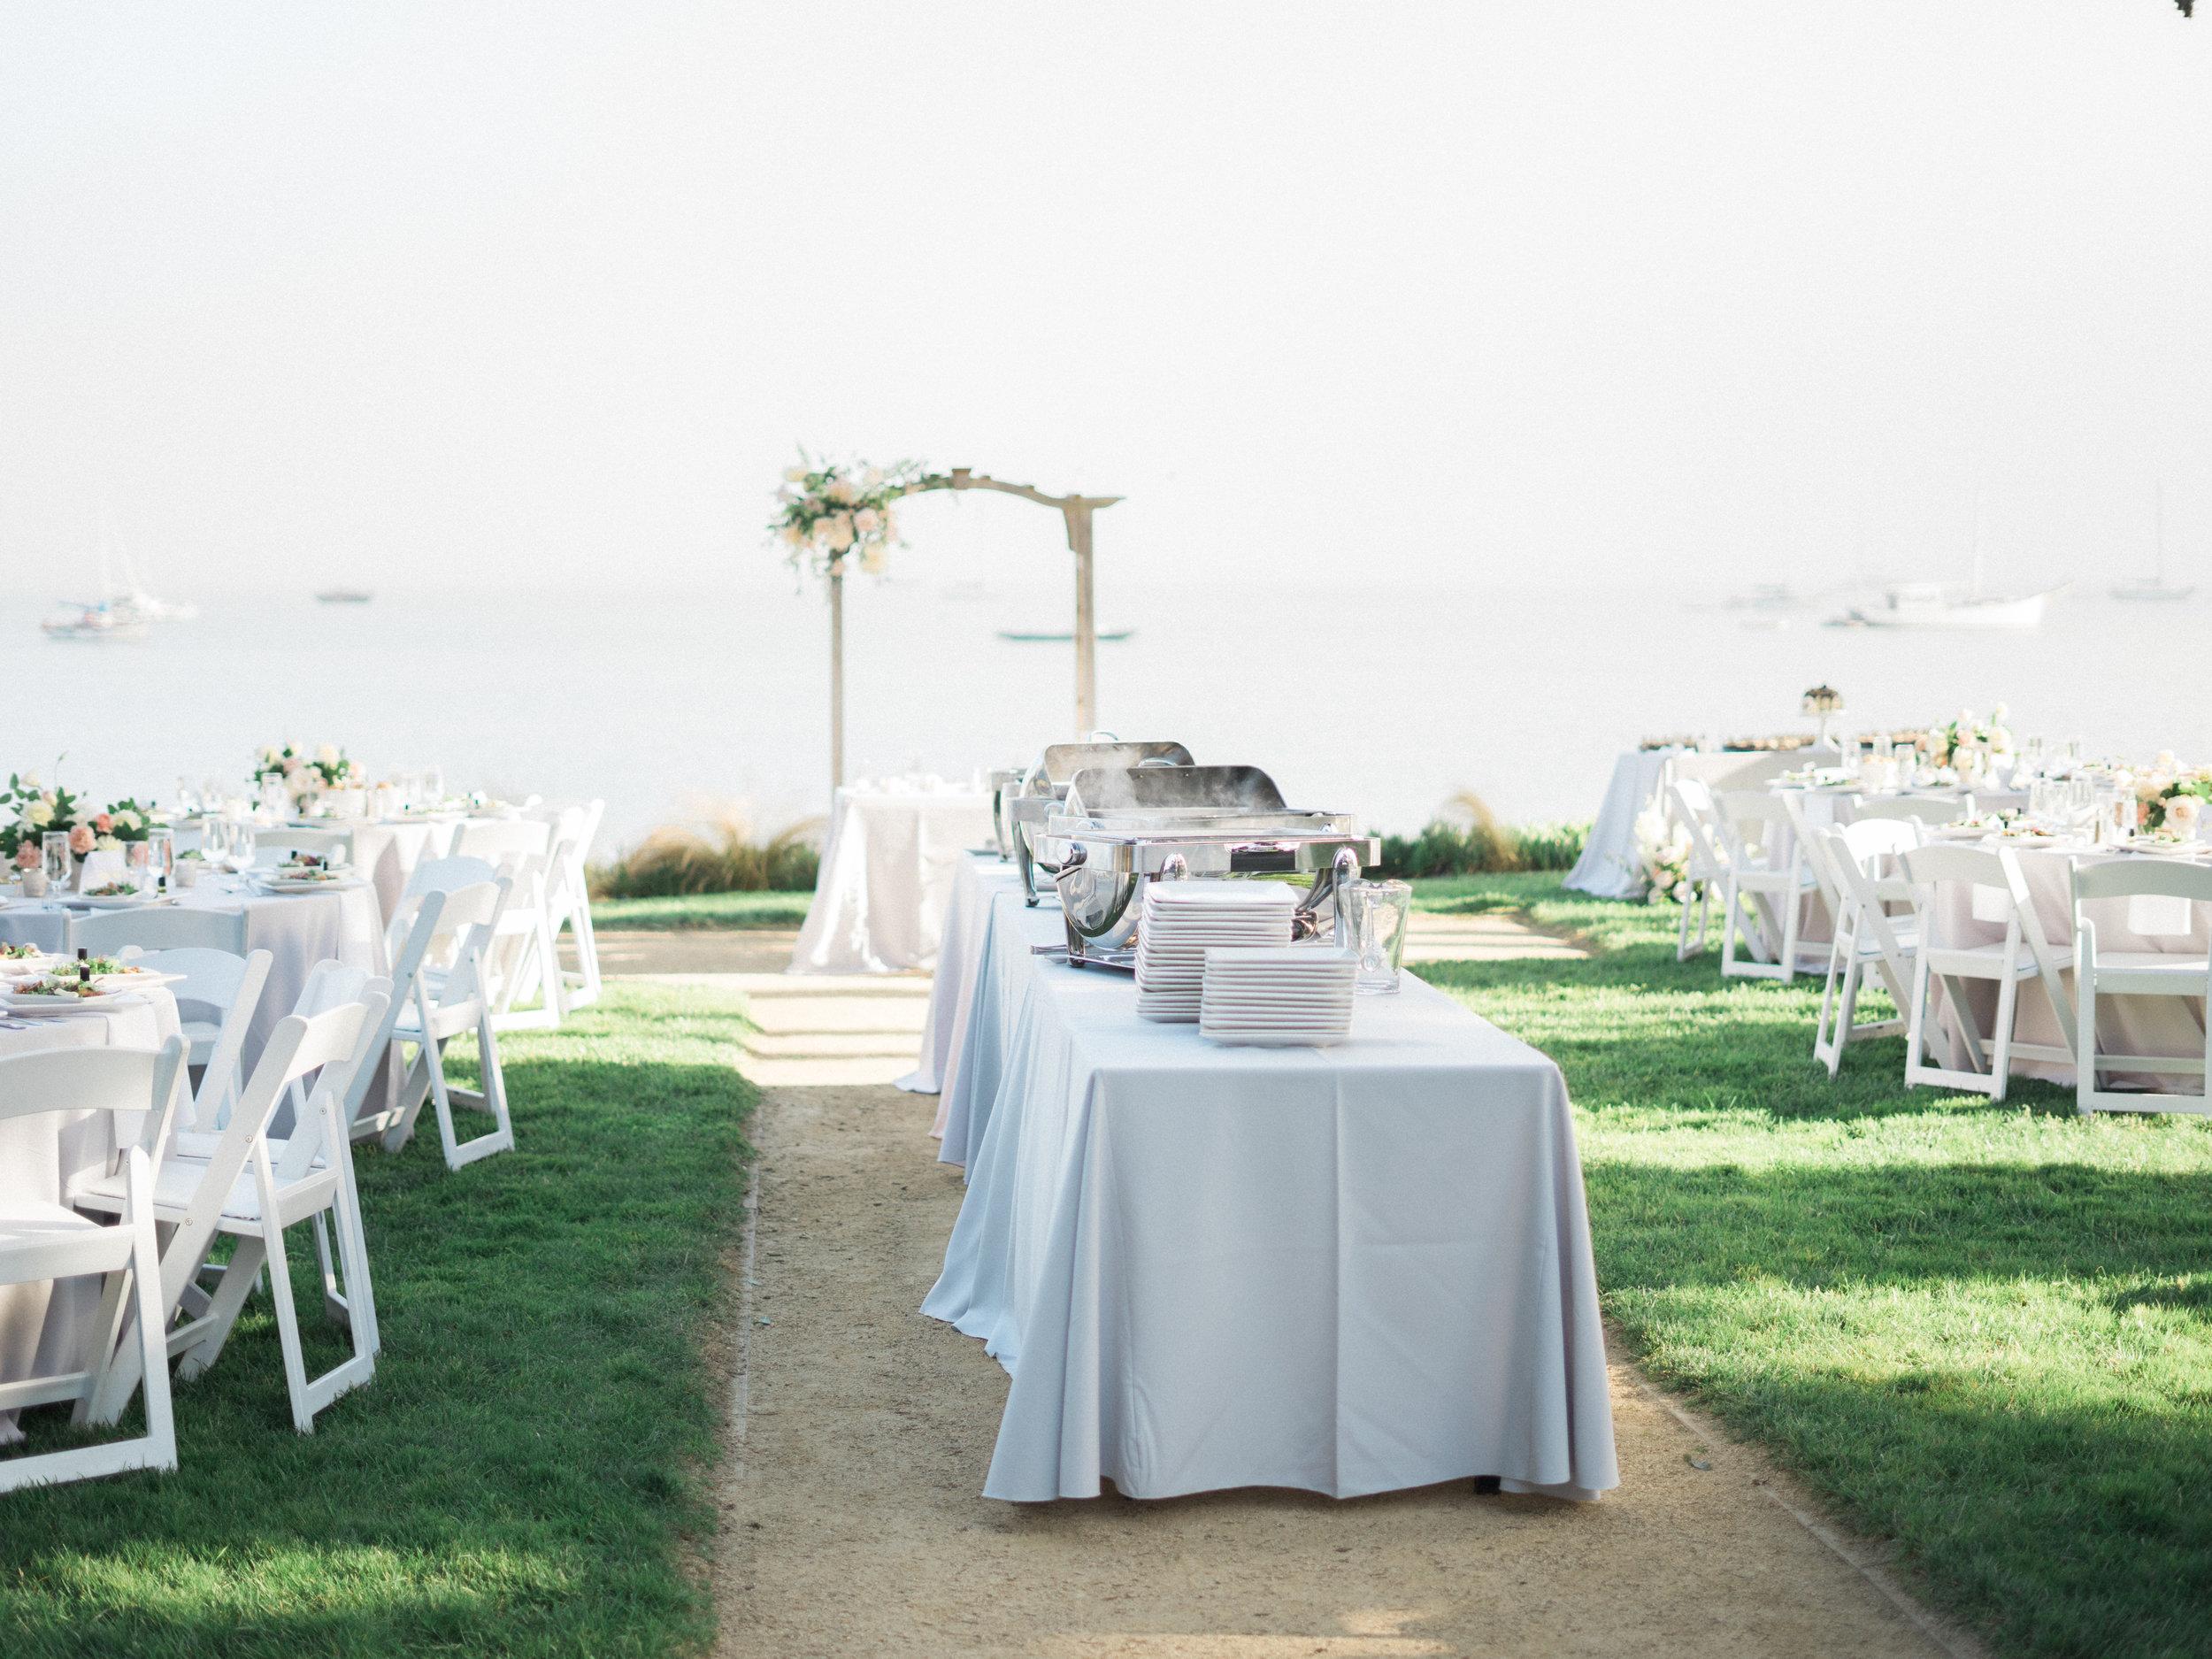 trynhphoto_socal_sf_halfmoon_bay_wedding_photographer_JA-439.jpg